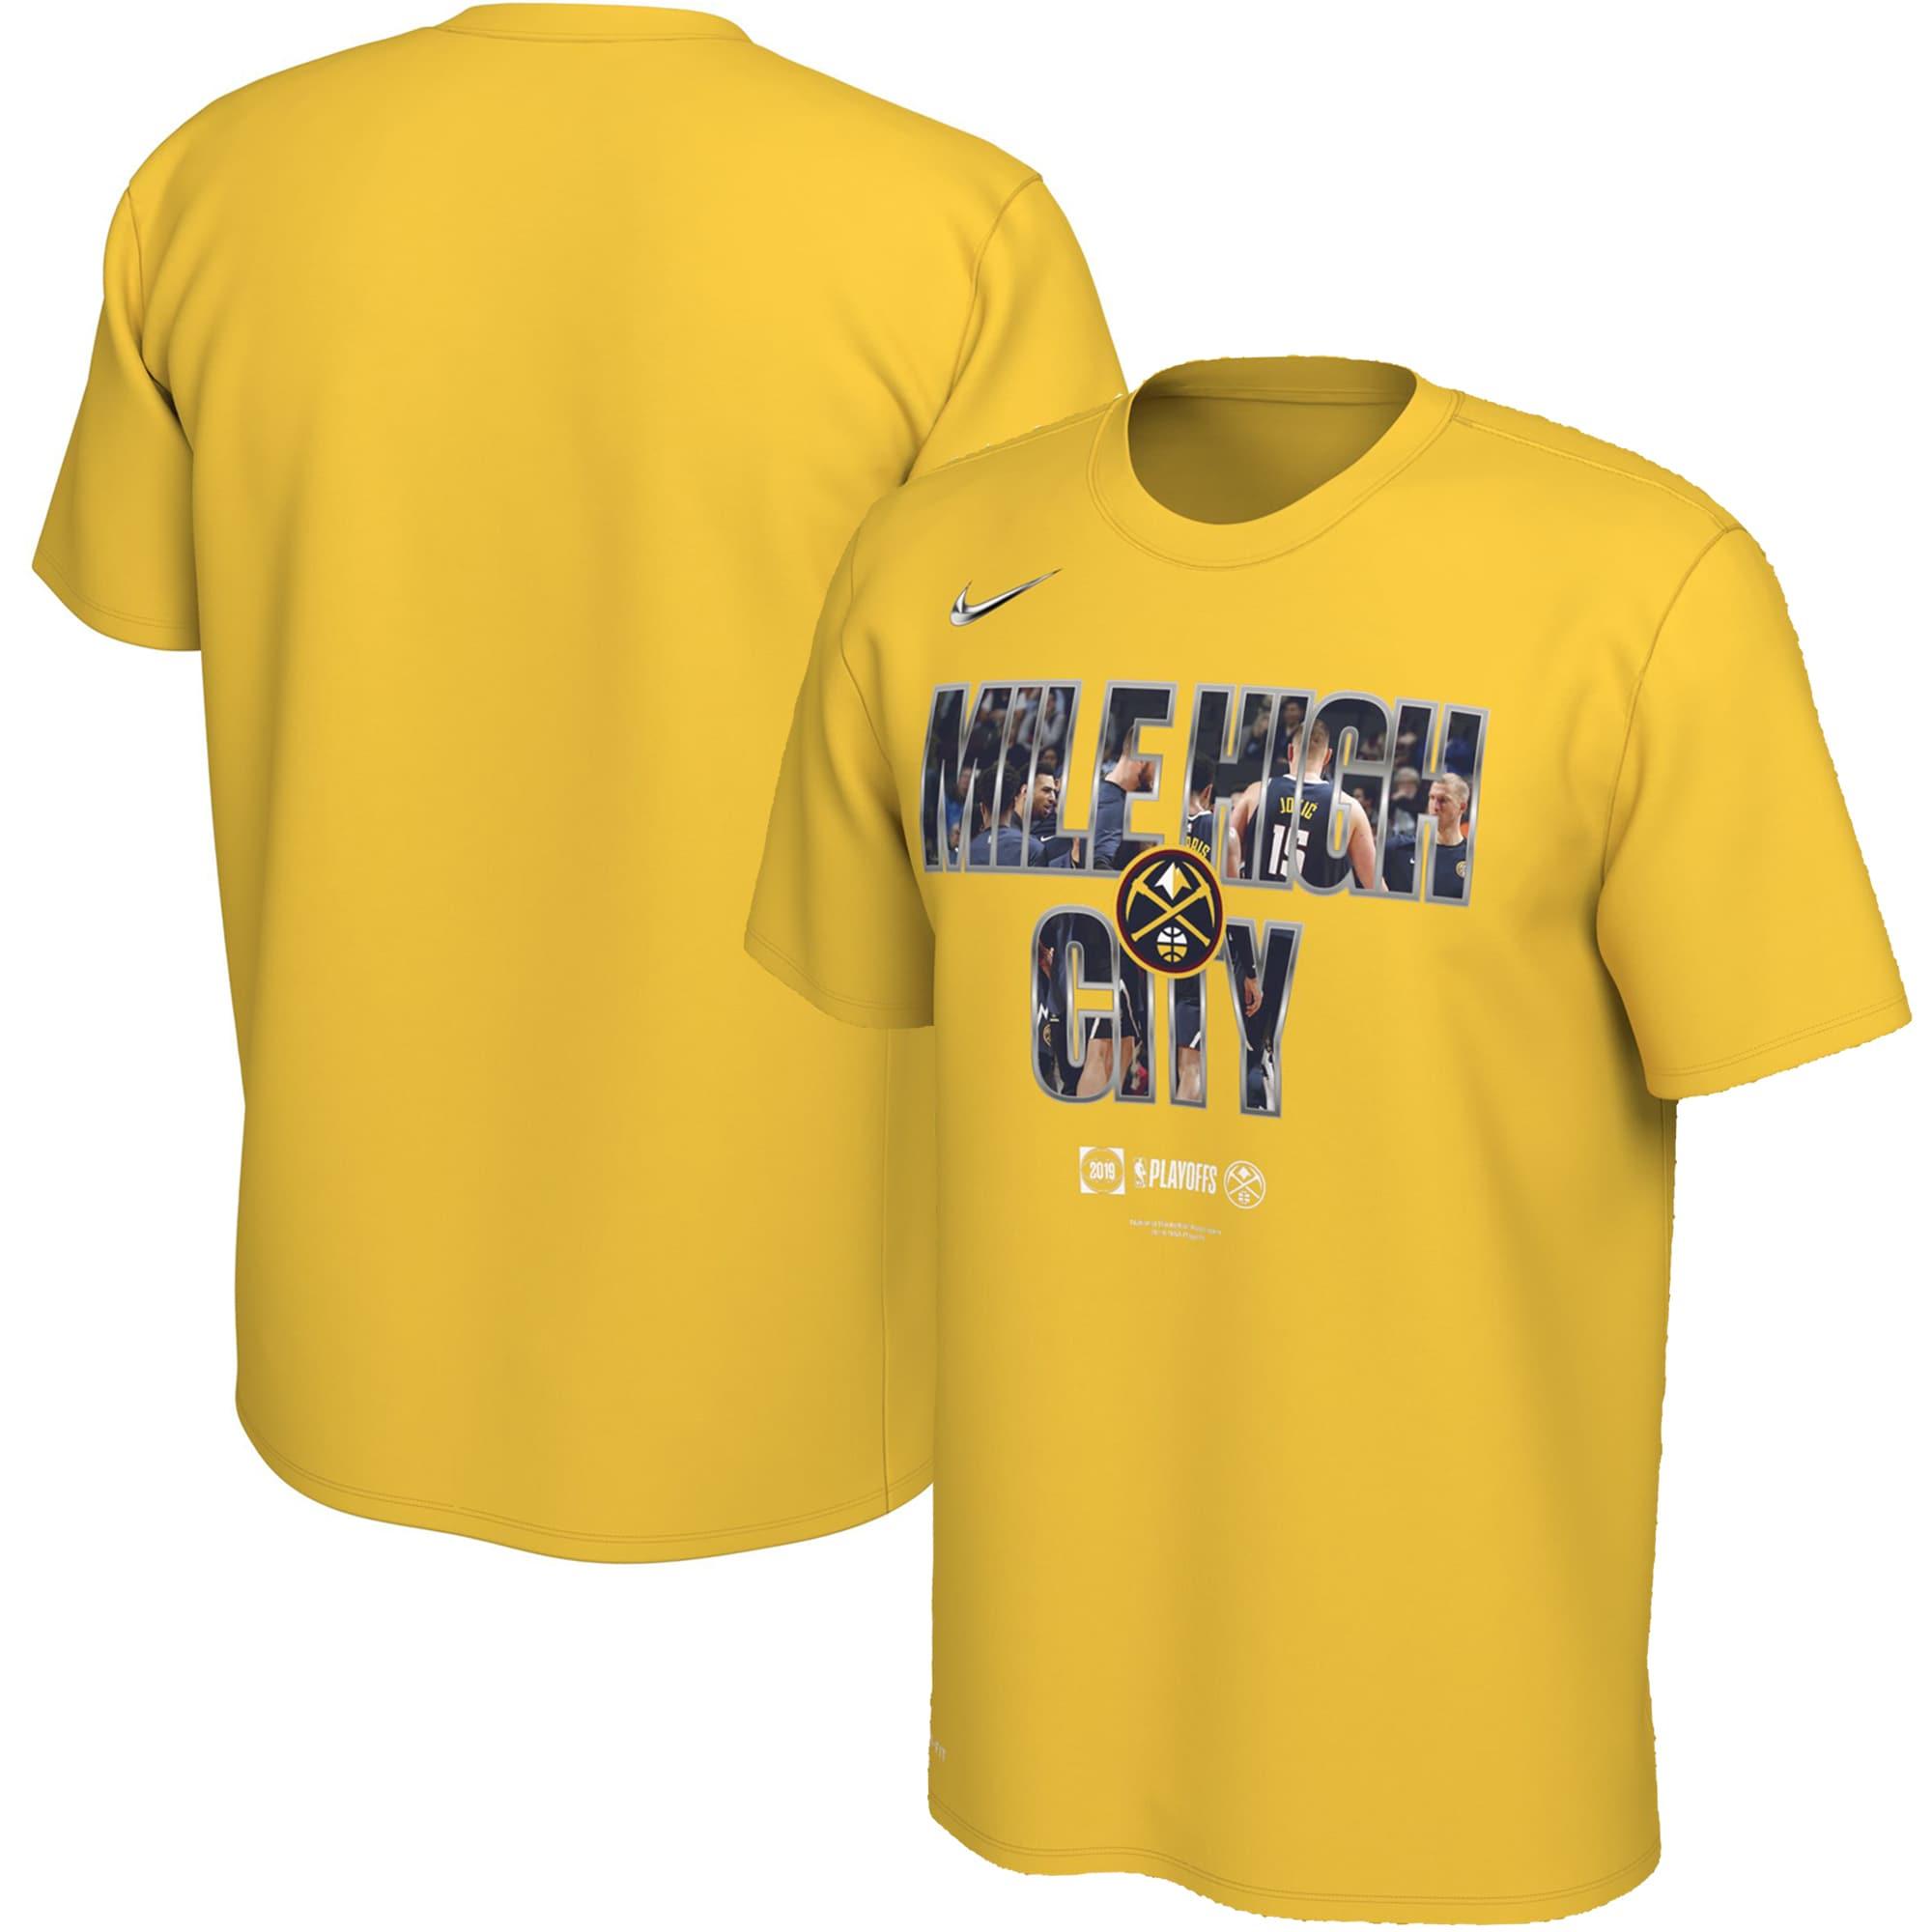 Denver Nuggets Nike 2019 NBA Playoffs Bound City DNA Dri-FIT T-Shirt - Gold